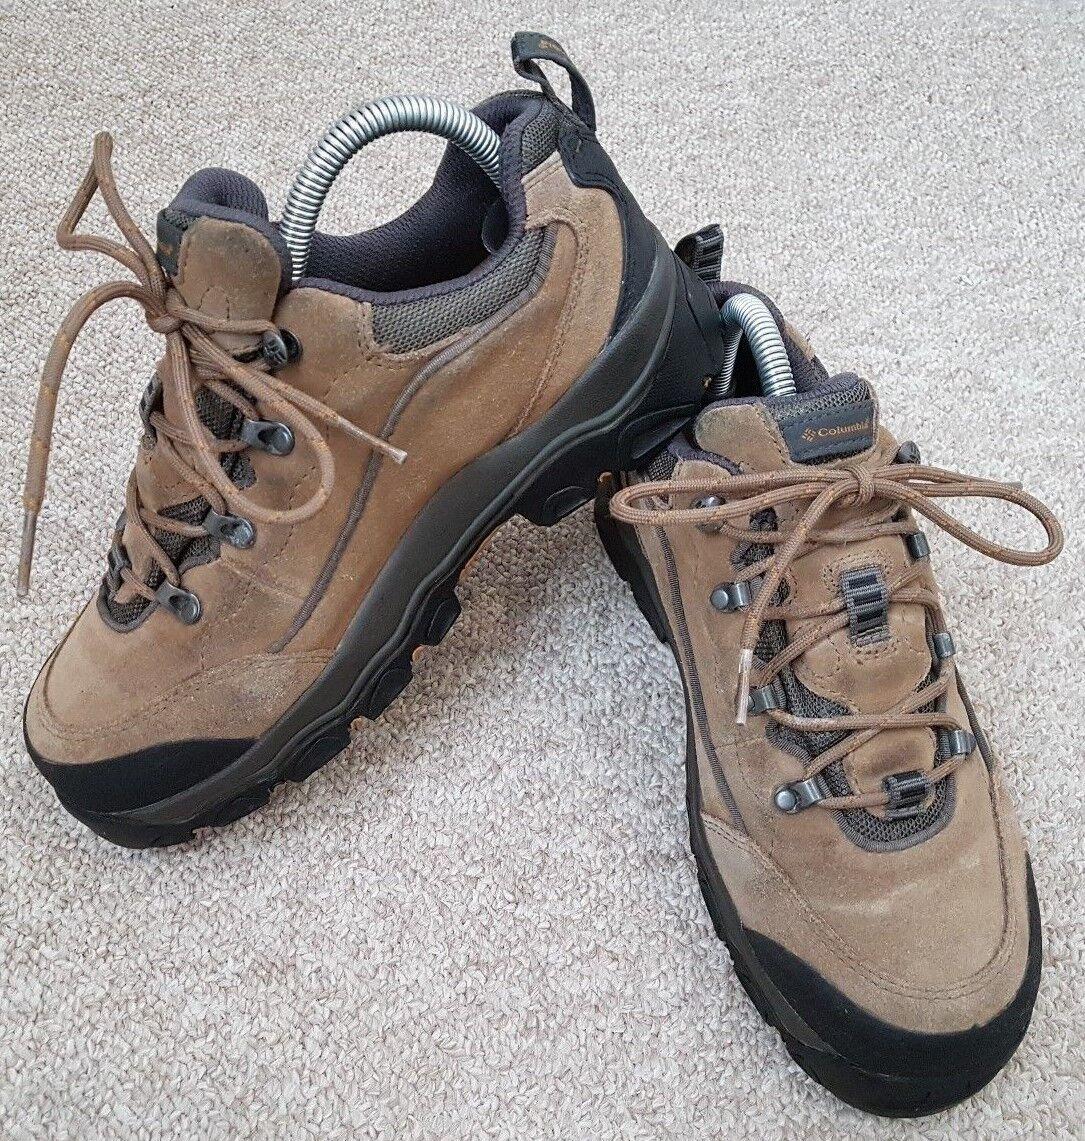 COLUMBIA Kimatak Low Waterproof Winter Hiking Trail shoes Boots Women US Sz 7.5